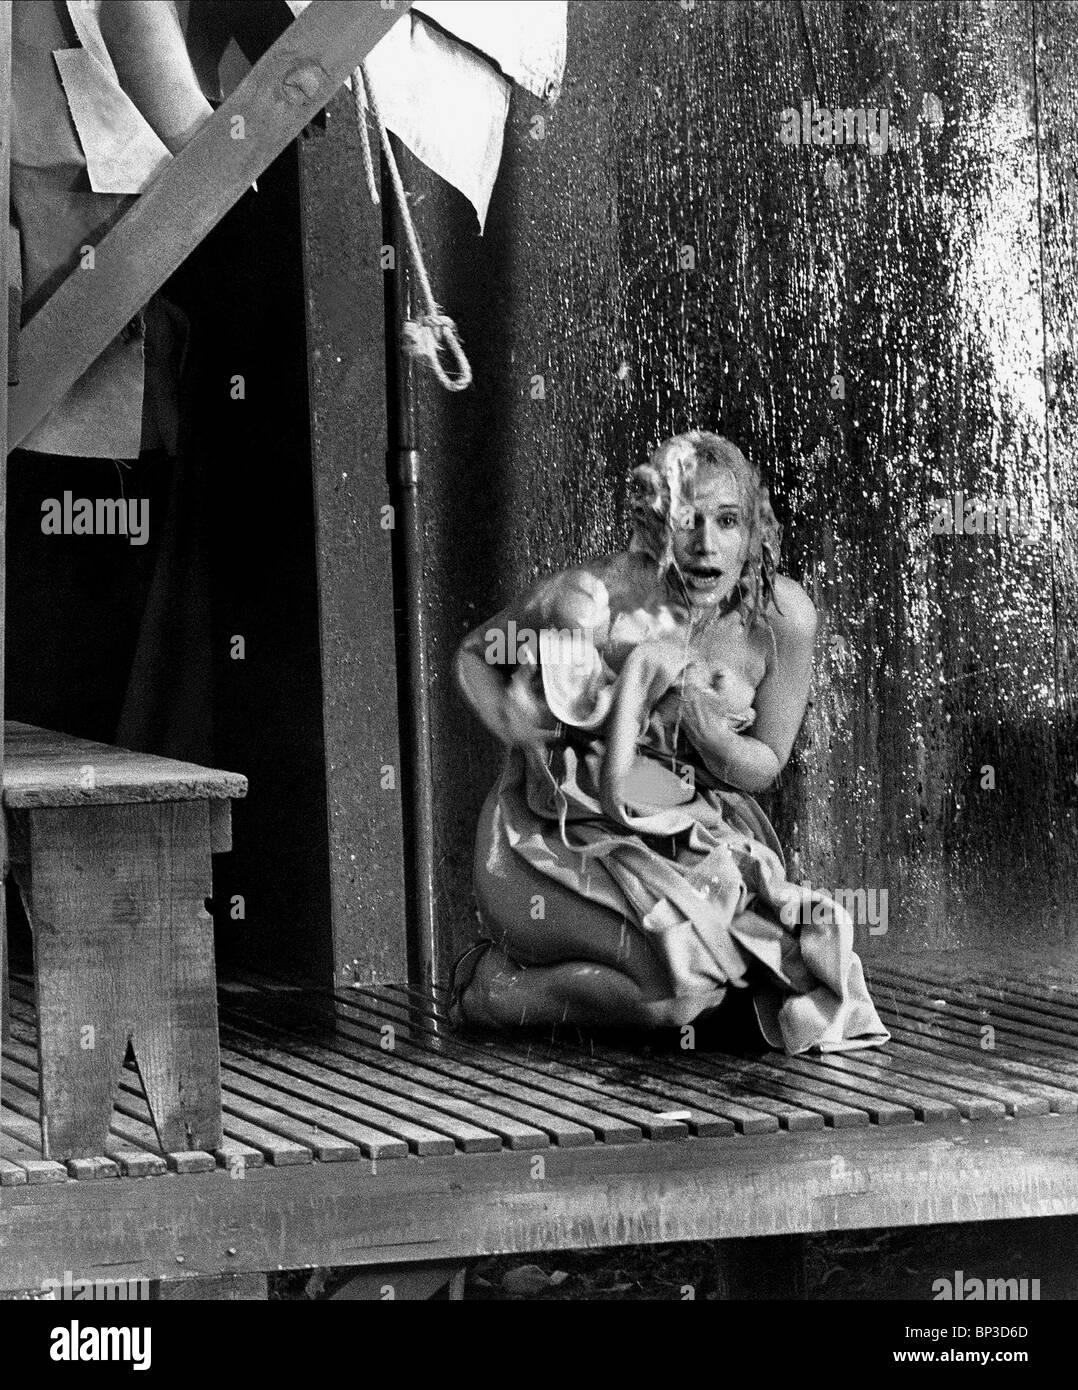 SALLY KELLERMAN MASH; M*A*S*H (1970)